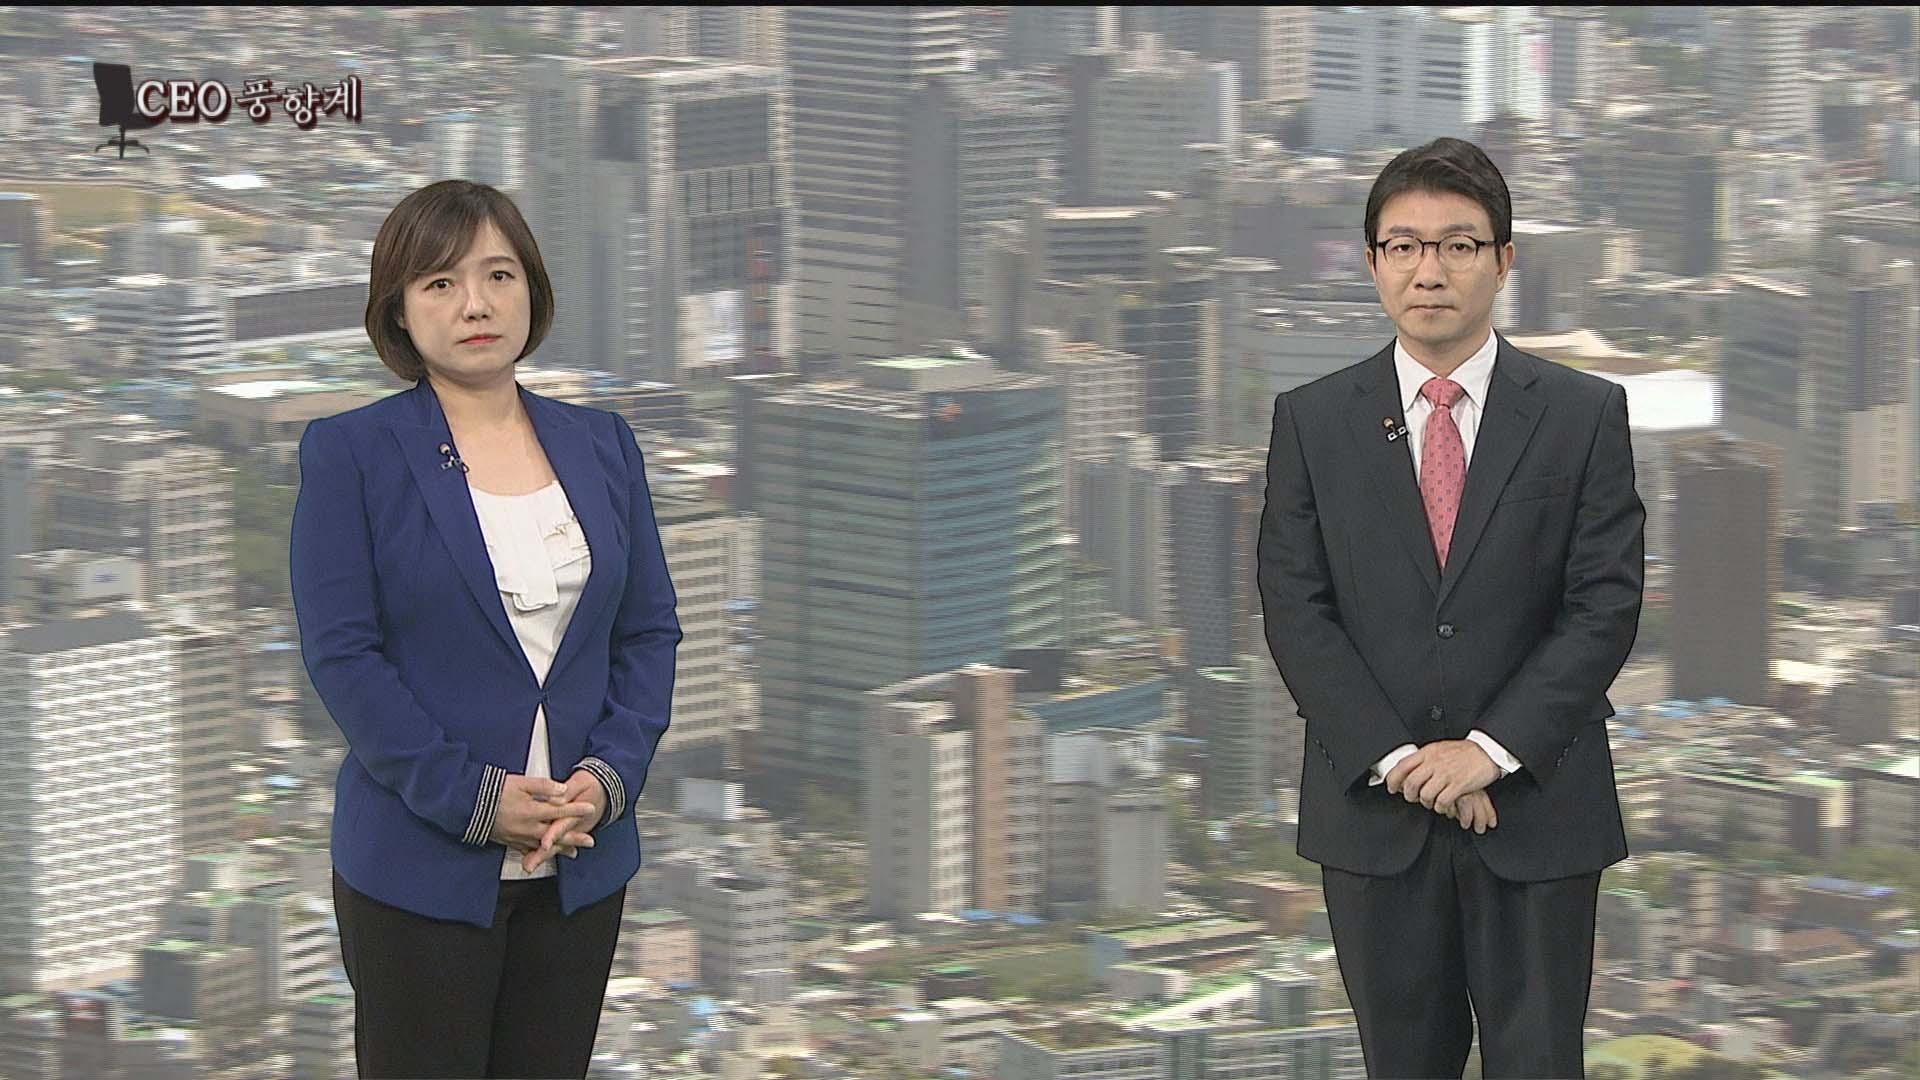 [CEO풍향계] 설 연휴 해외경영 이재용…'3세 경영' 가속 김동관